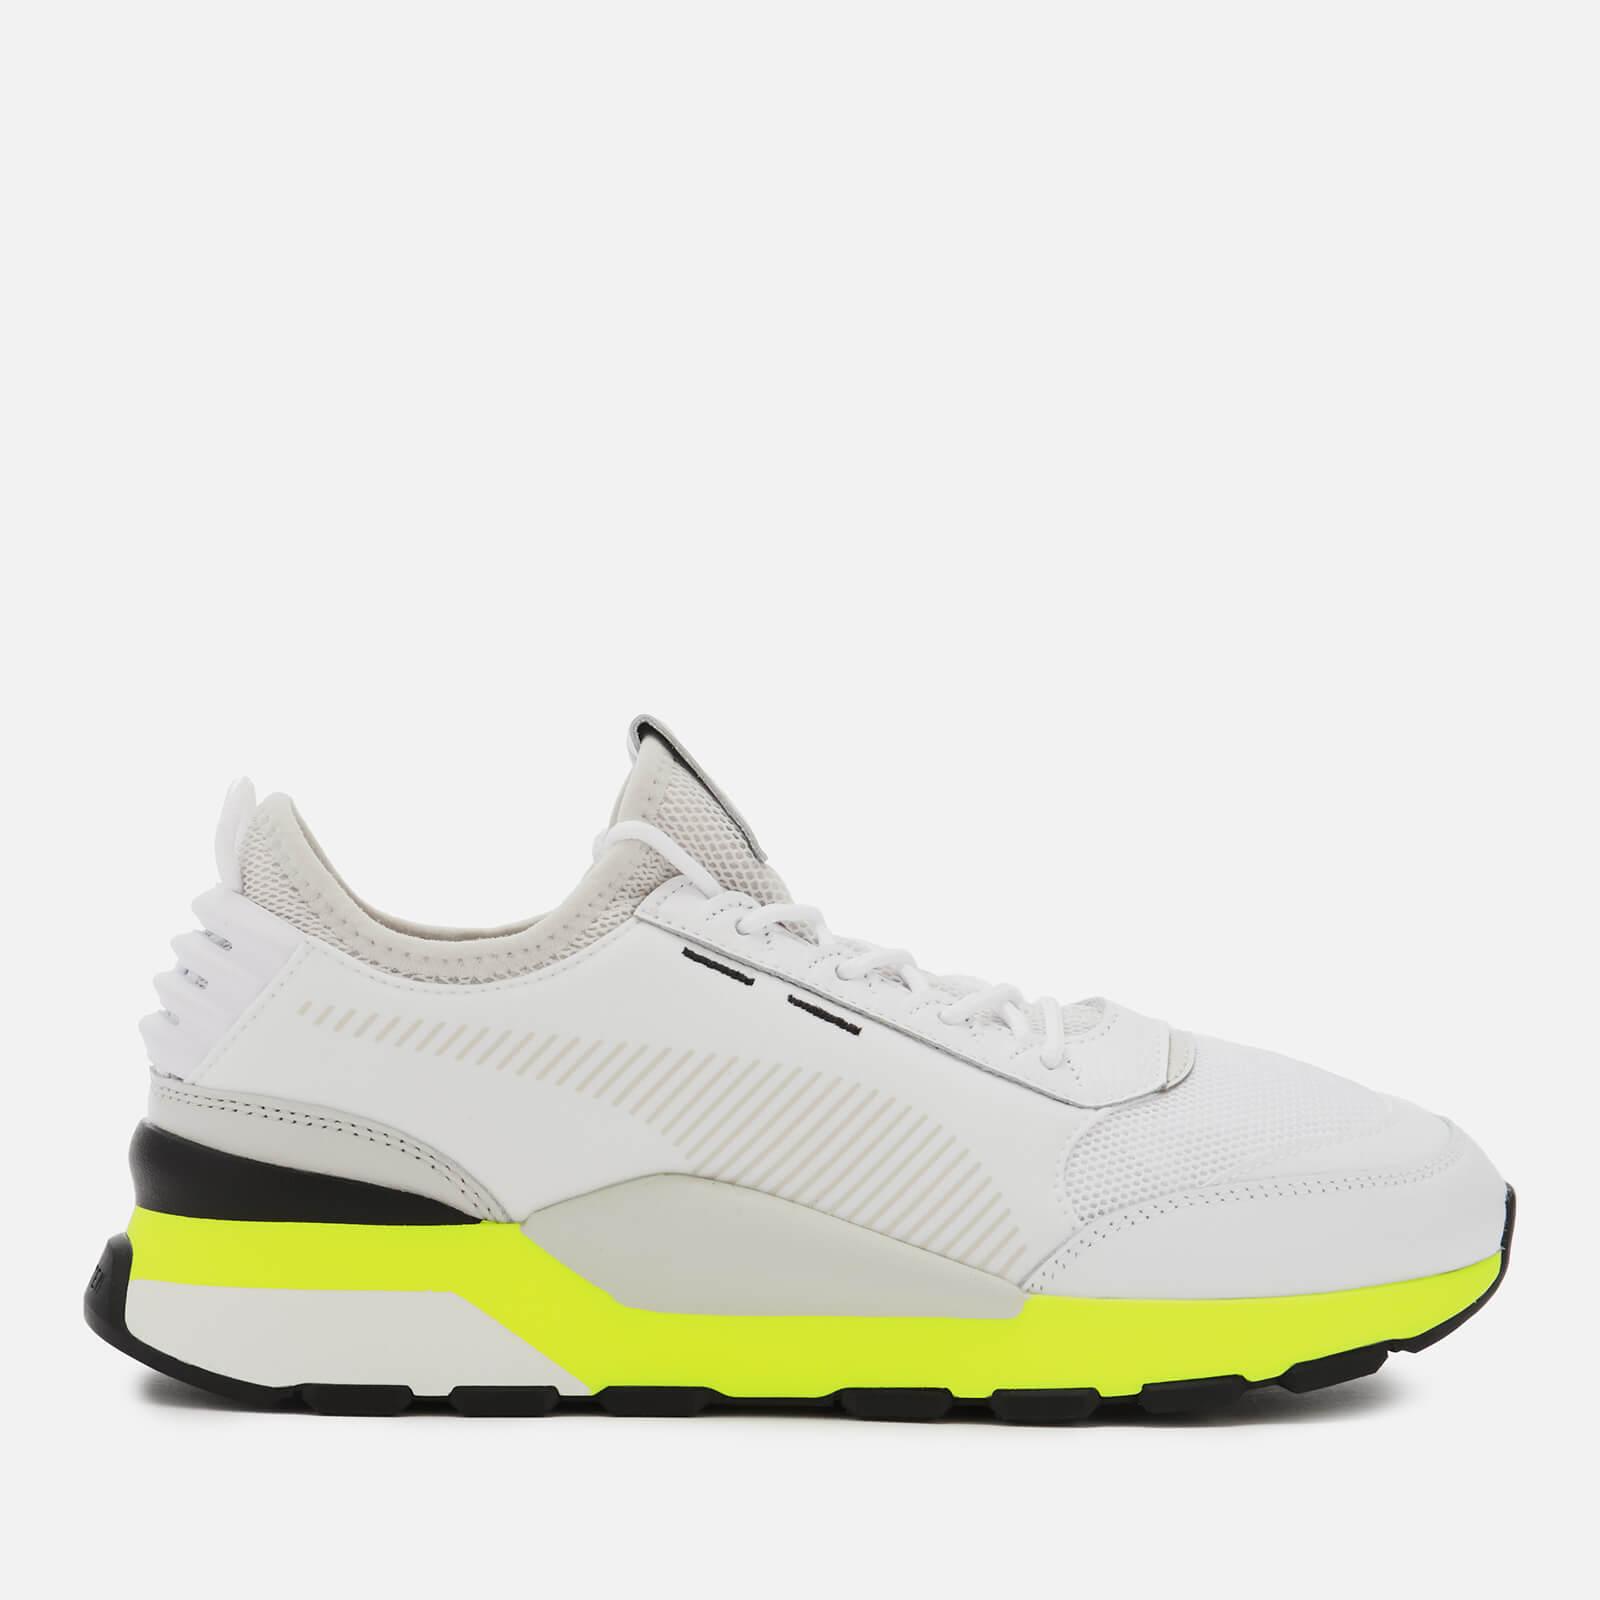 Puma Men's RS-0 Tracks Trainers - Puma White/Fizzy Yellow